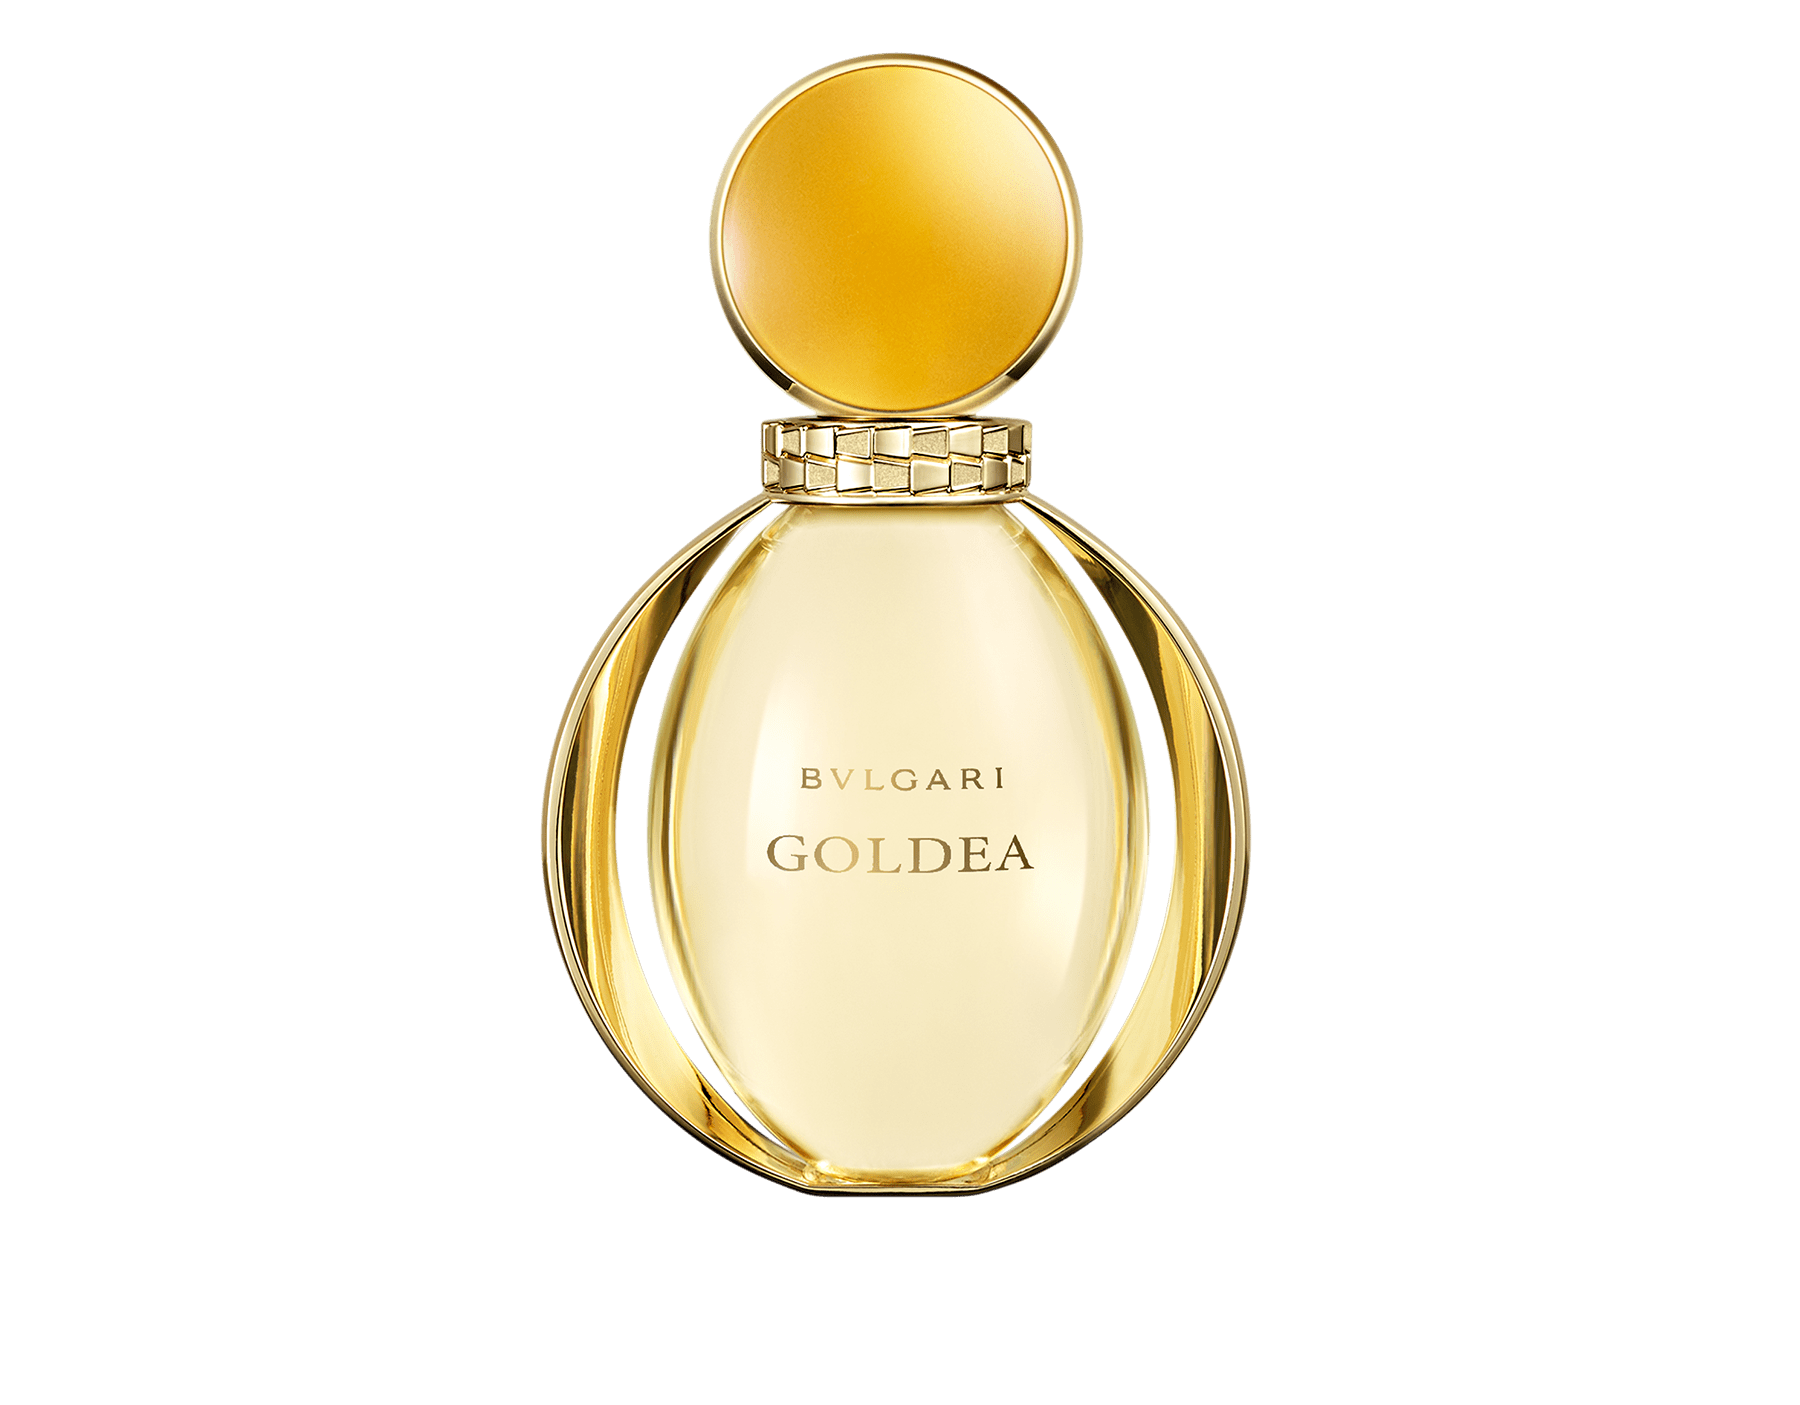 Goldea by Bvlgari for Women - 90 ml - Eau de Parfum